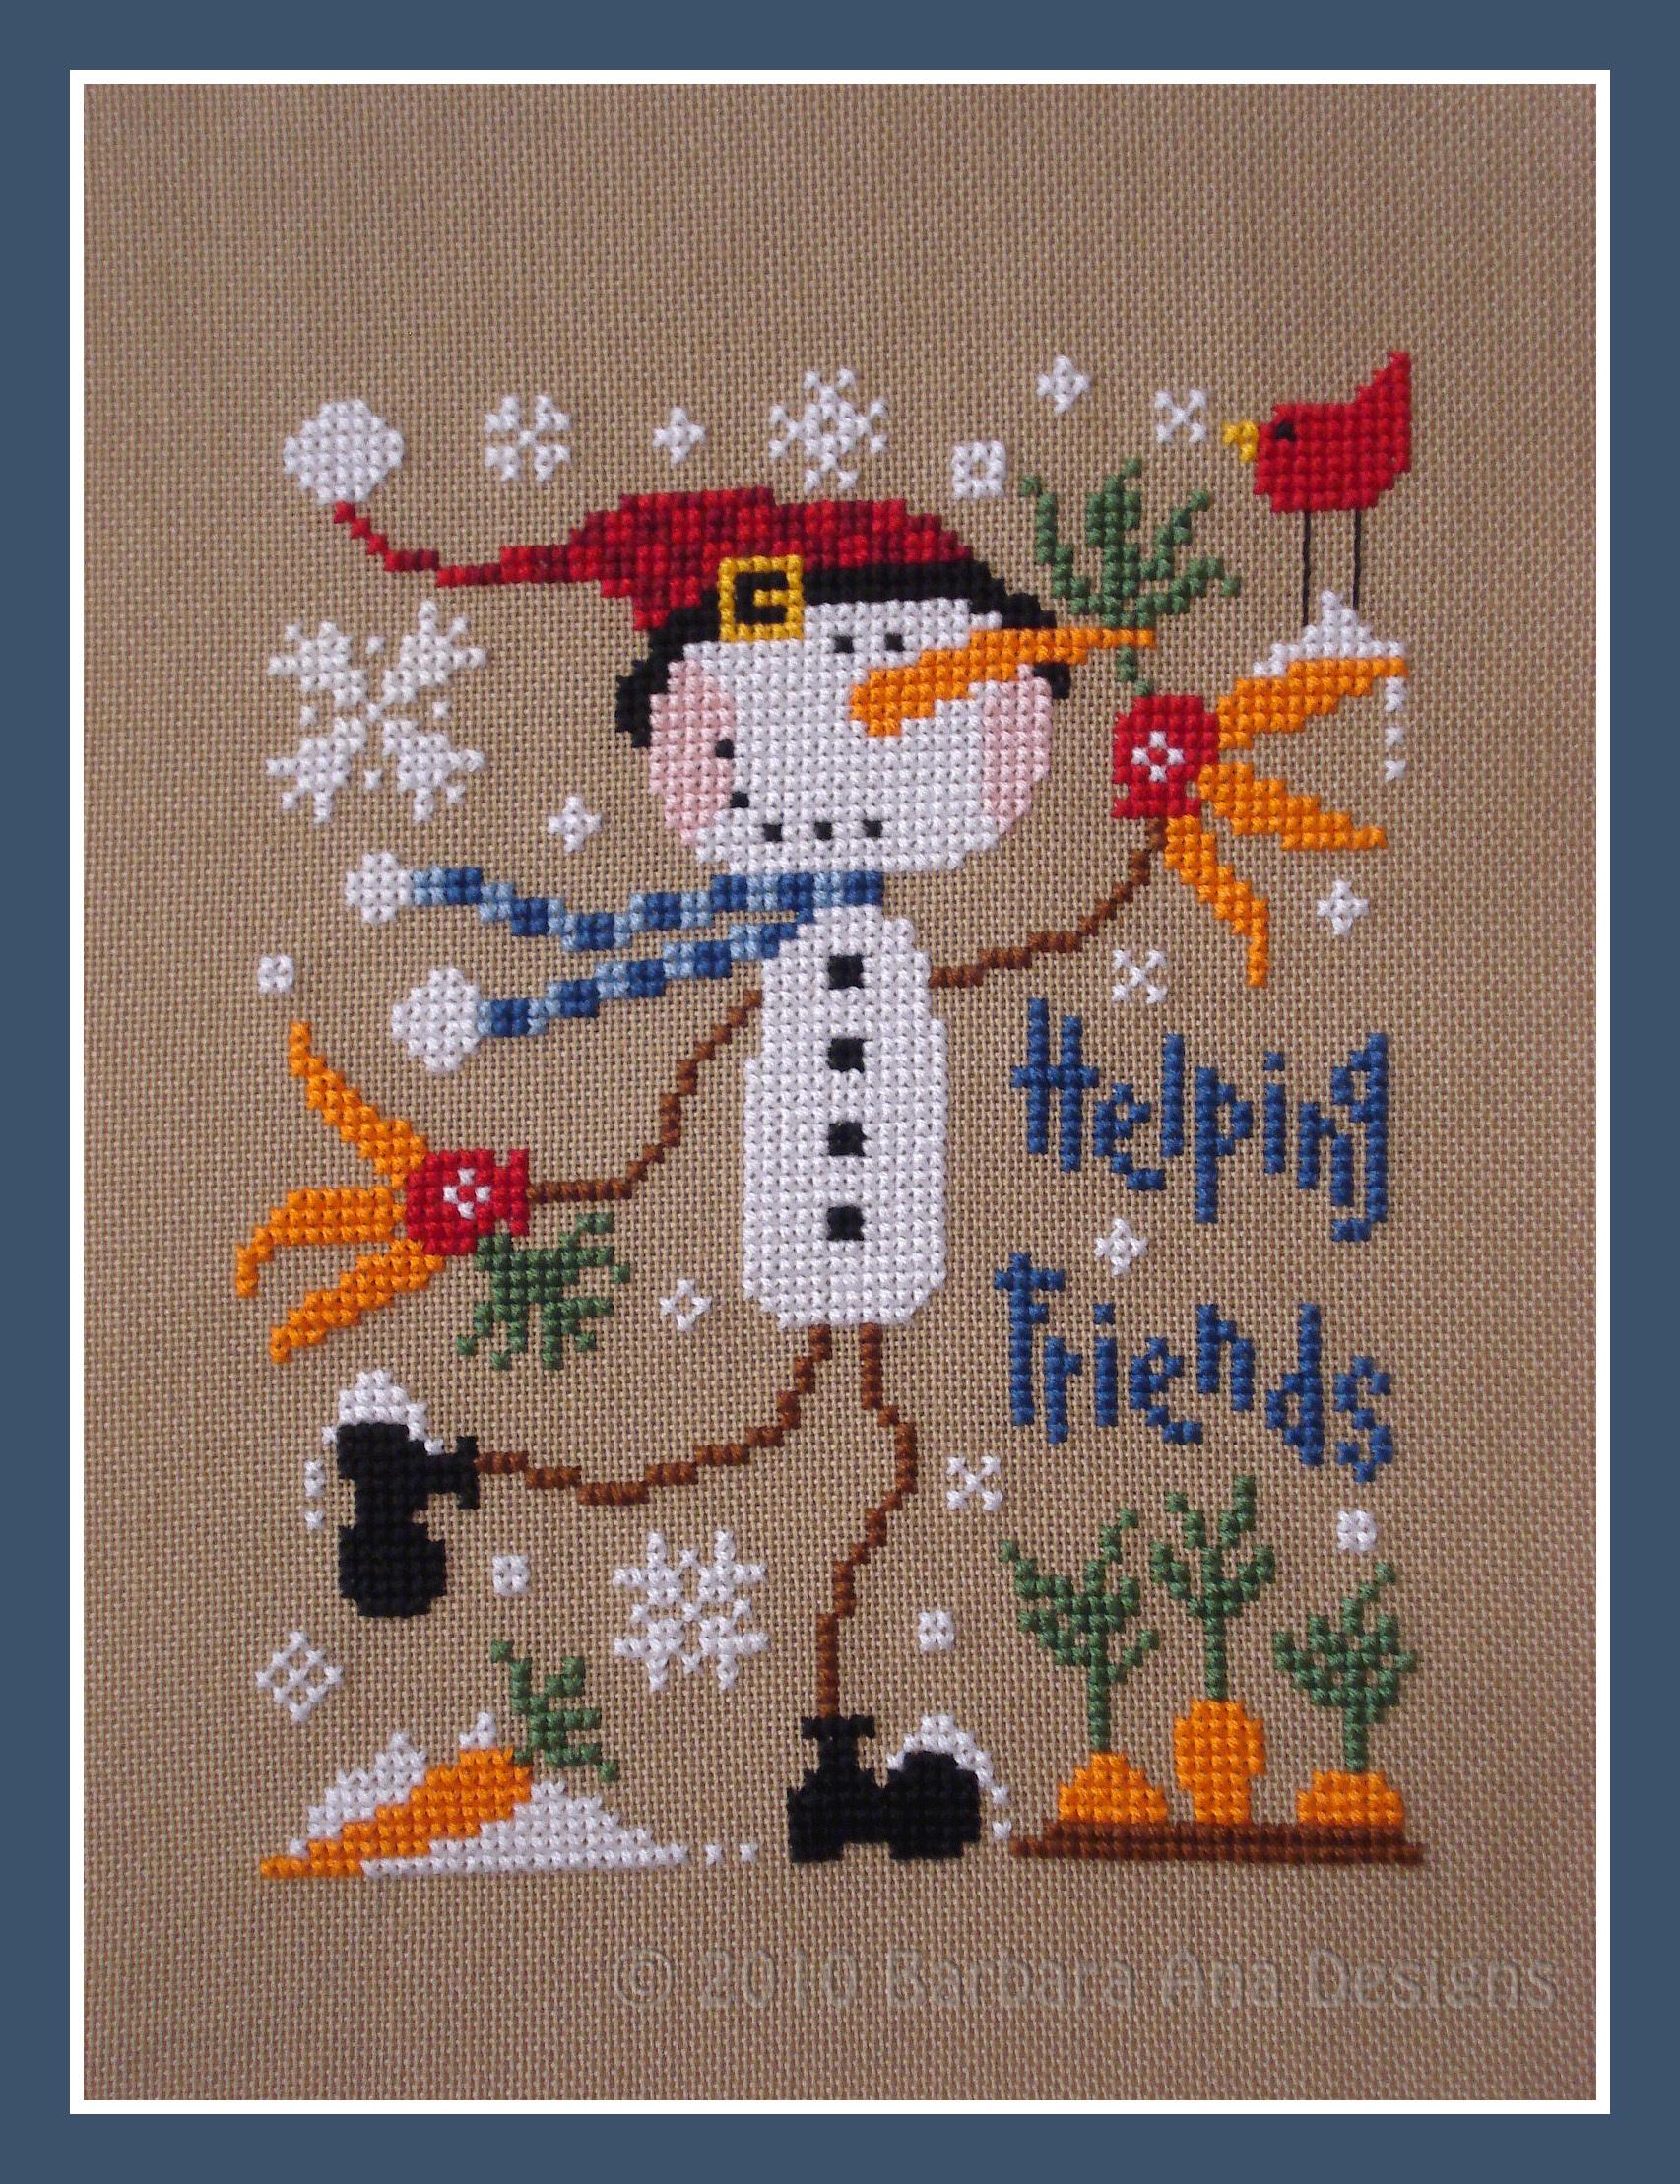 Helping friends 4254921597 o